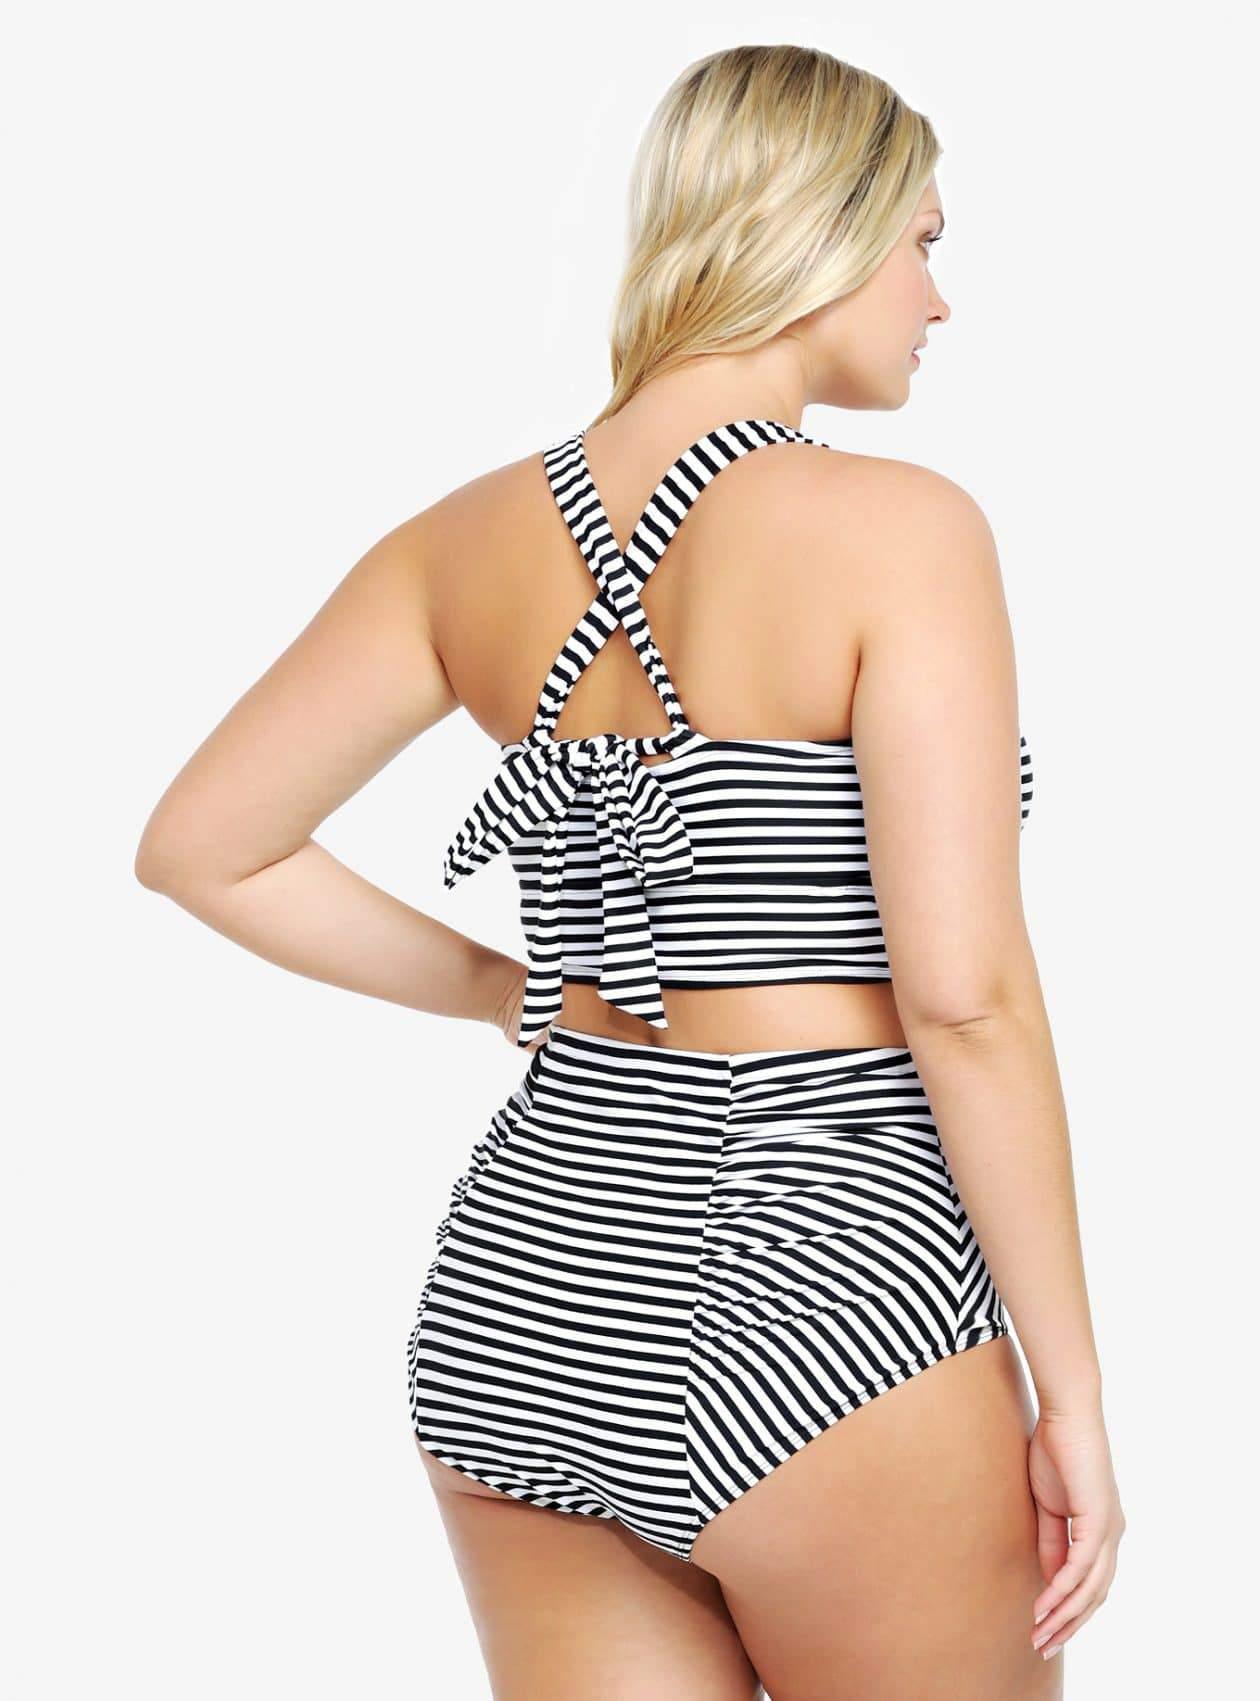 Torrid Striped Plus Size Bikini on The Curvy Fashionista